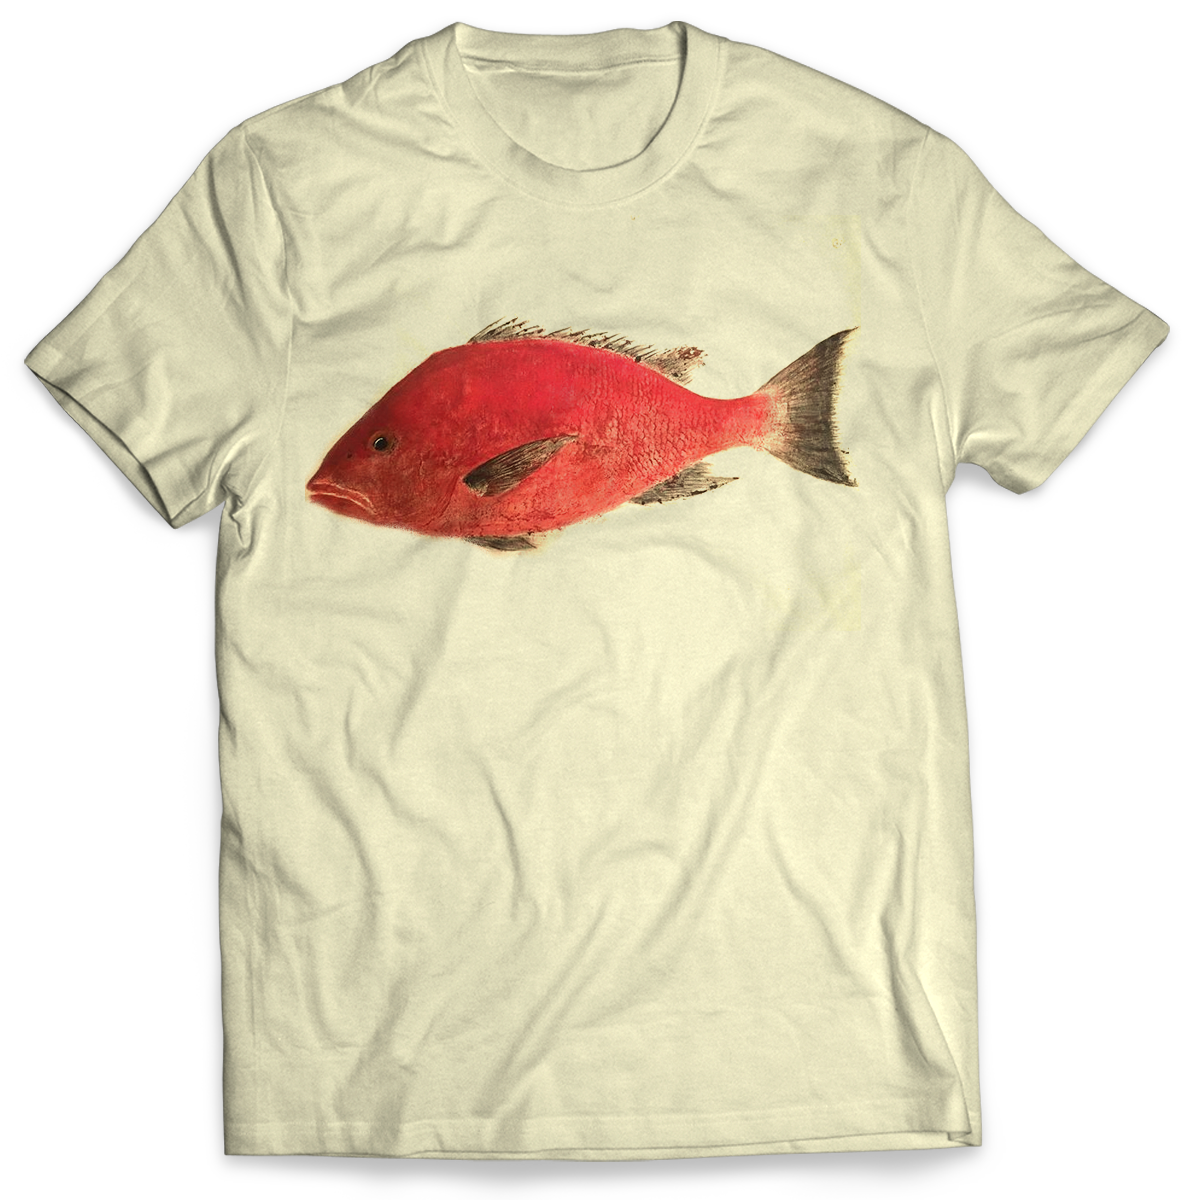 Fish-Shirt